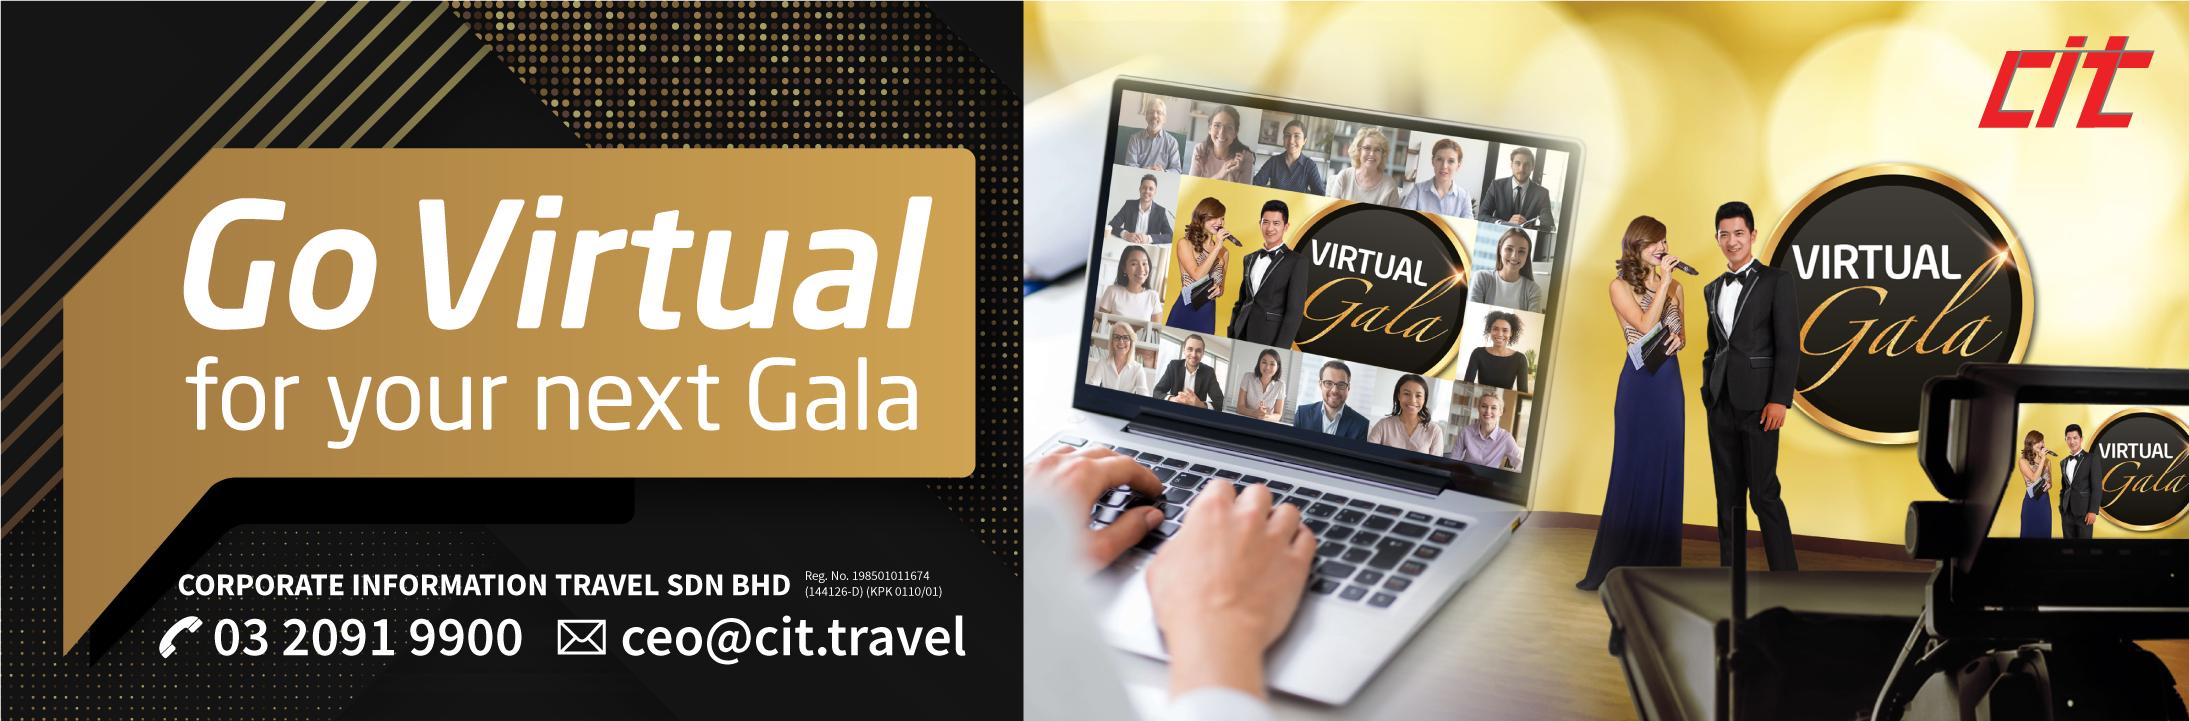 Virtual Gala Virtual Gala EmailBanner 4